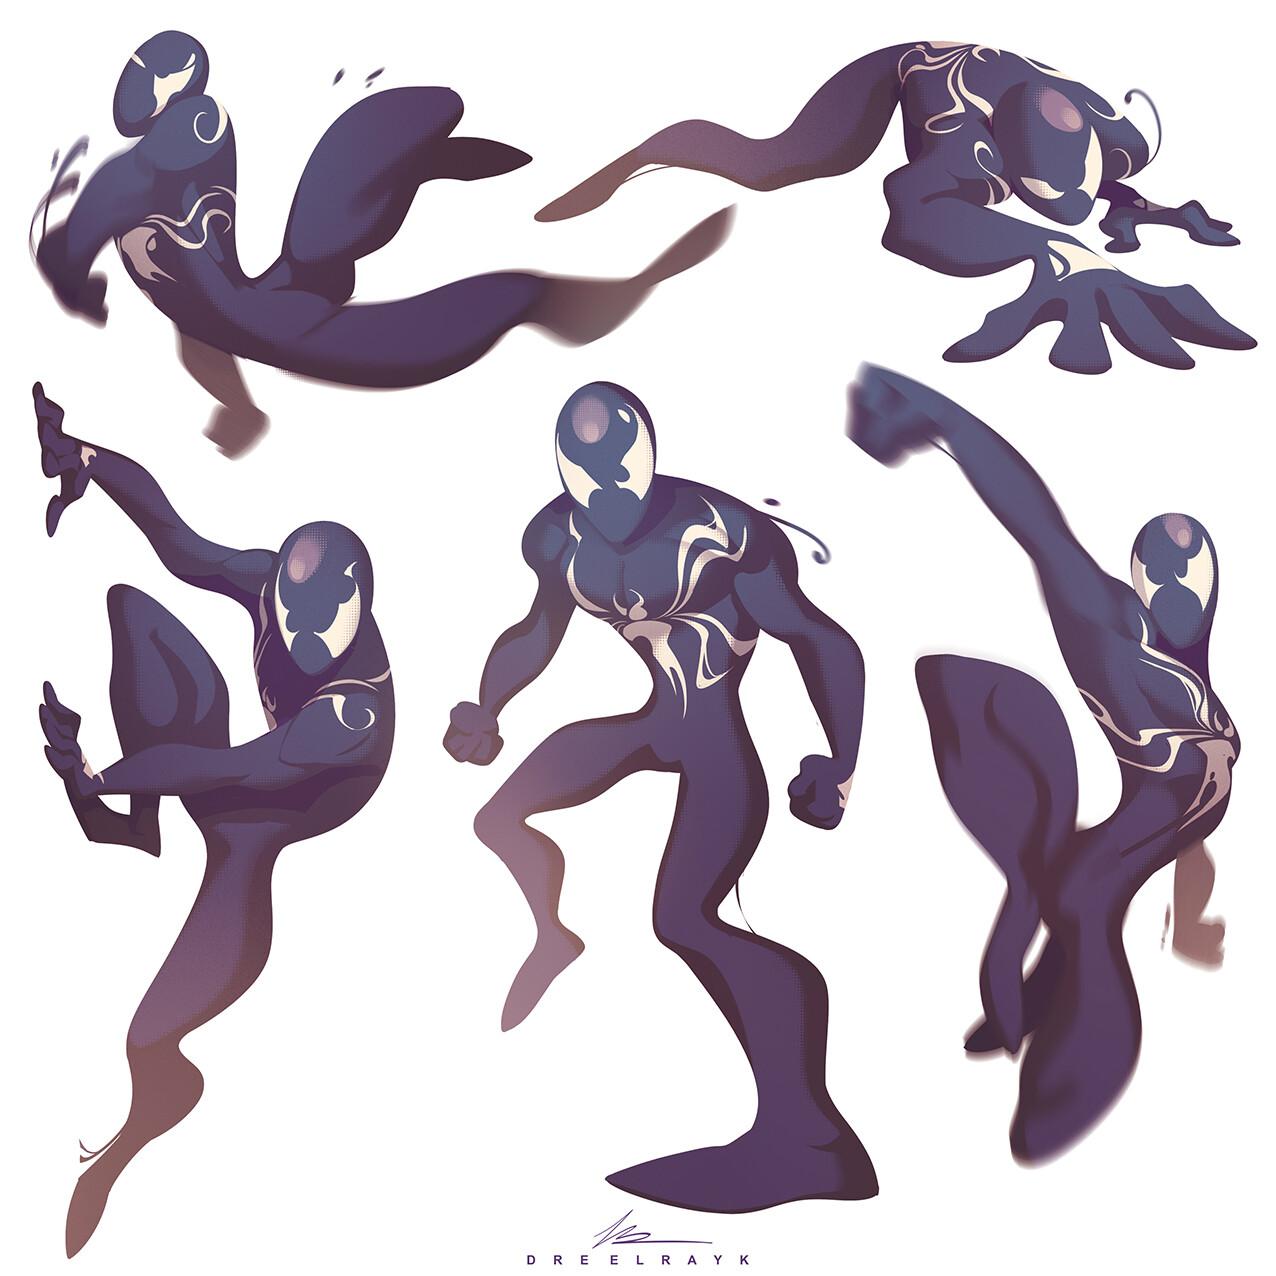 Valerio dreelrayk buonfantino black spiderman